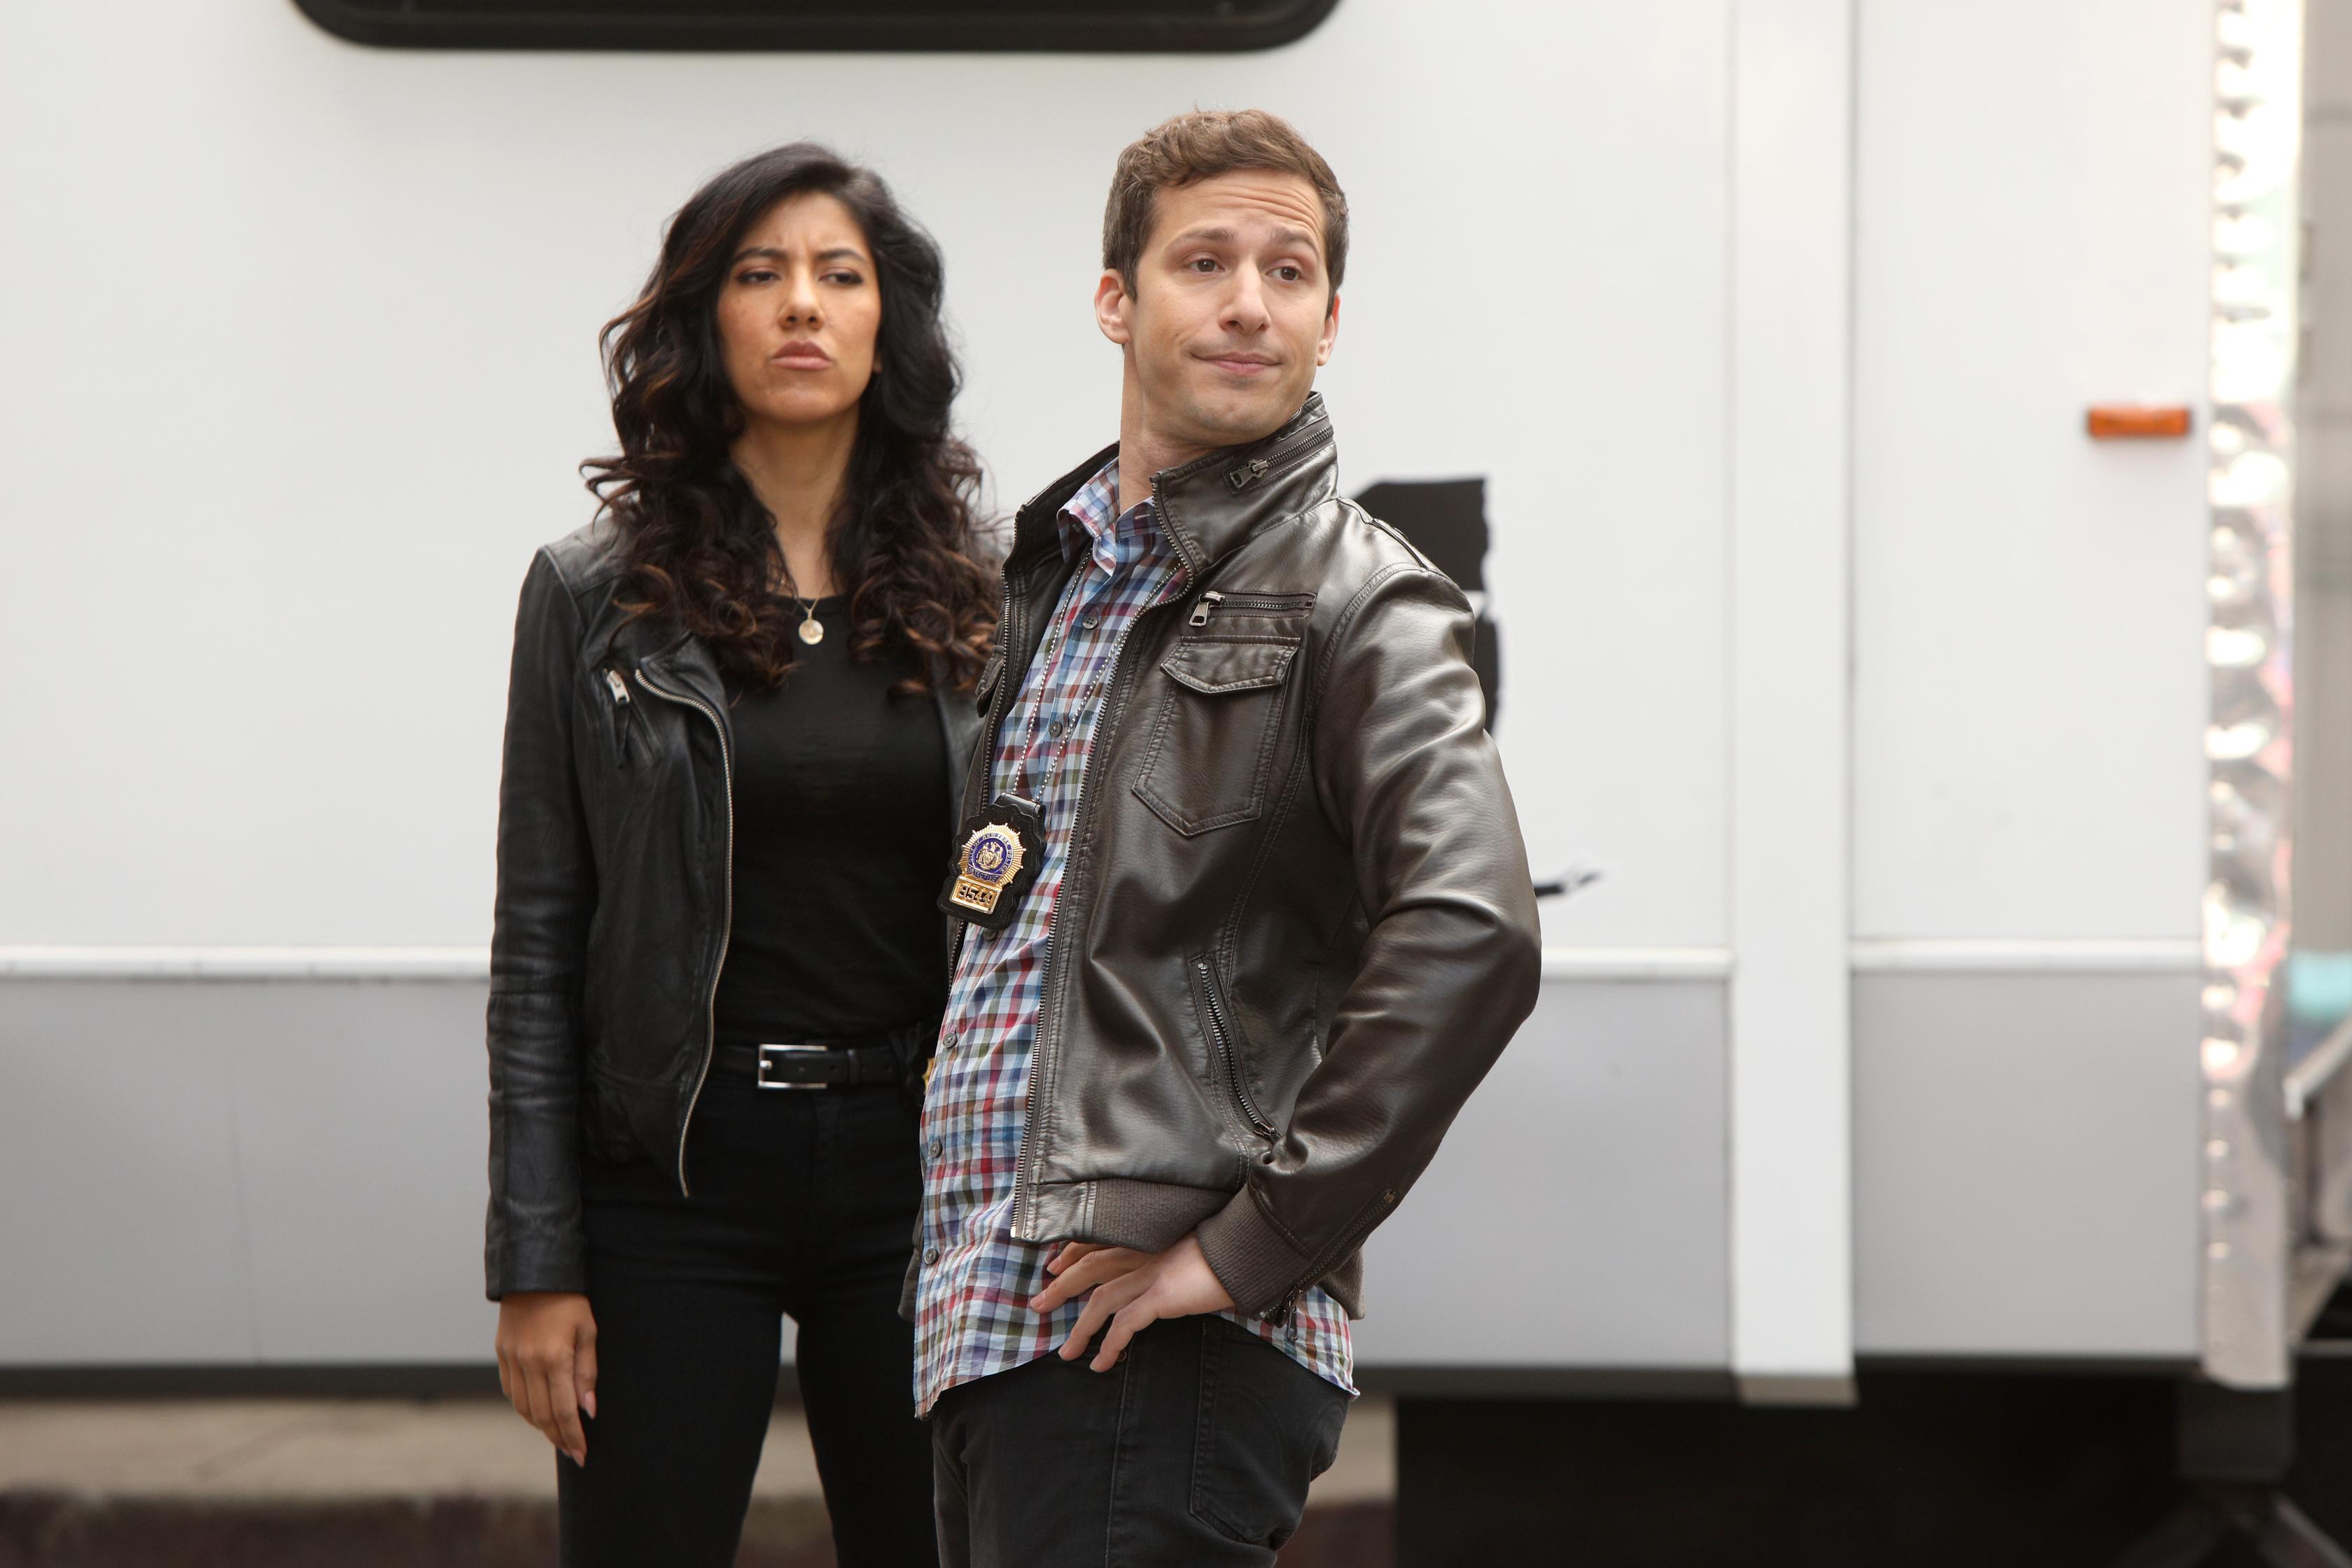 Brooklyn Nine-Nine: Serve & Protect | Season 4 | Episode 14